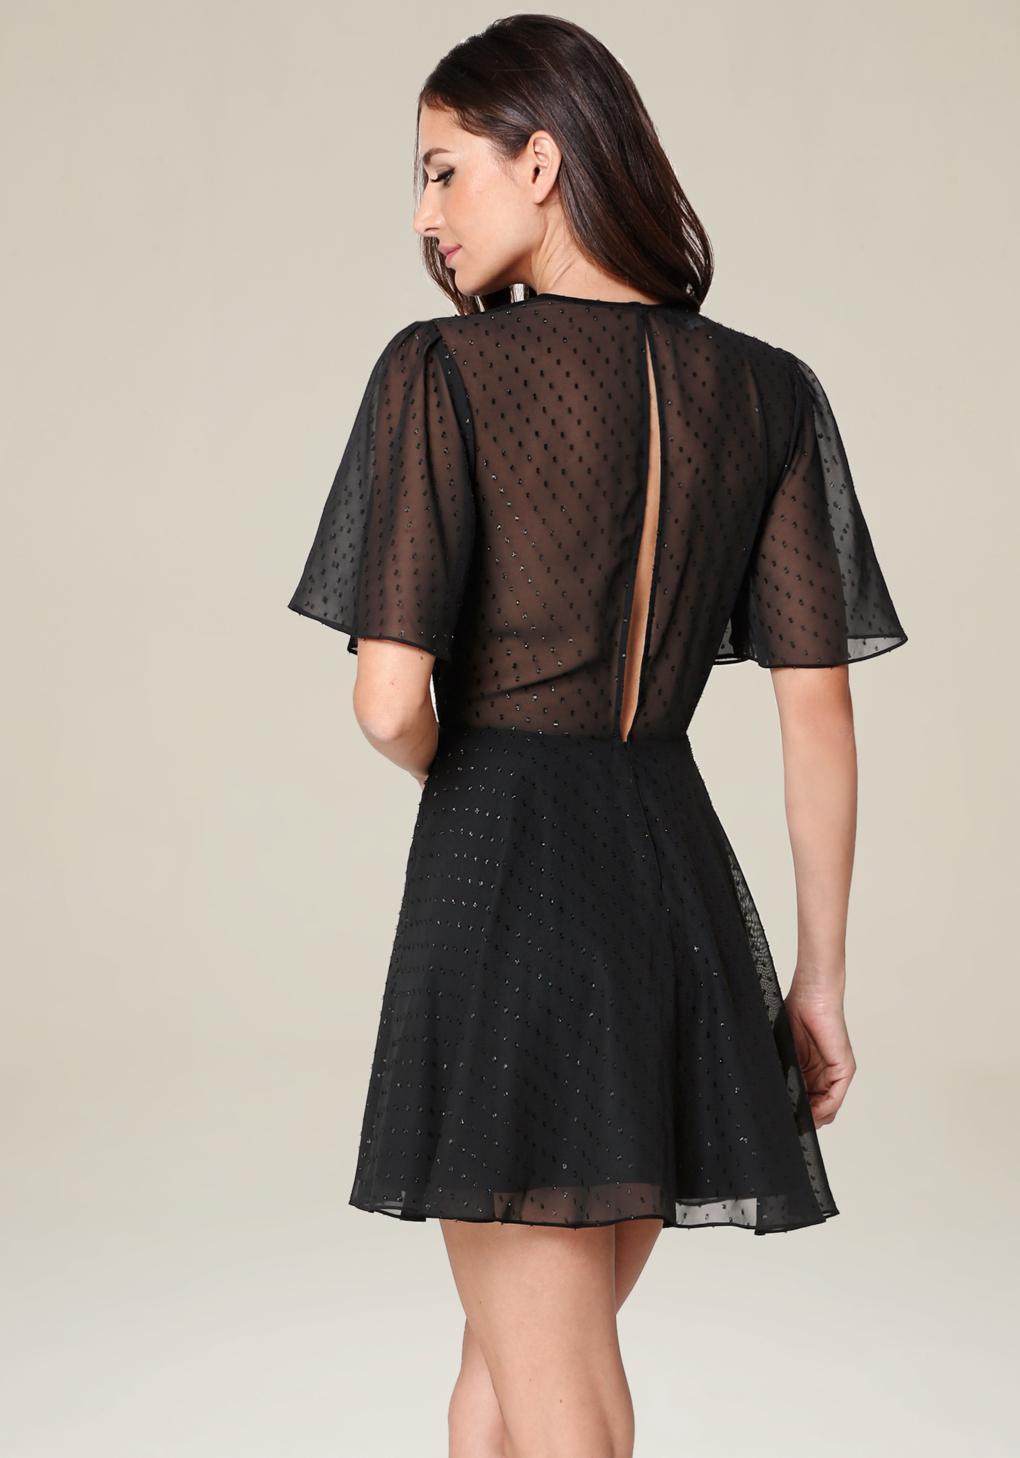 Lyst bebe dotted georgette dress in black for Bebe dresses wedding guest